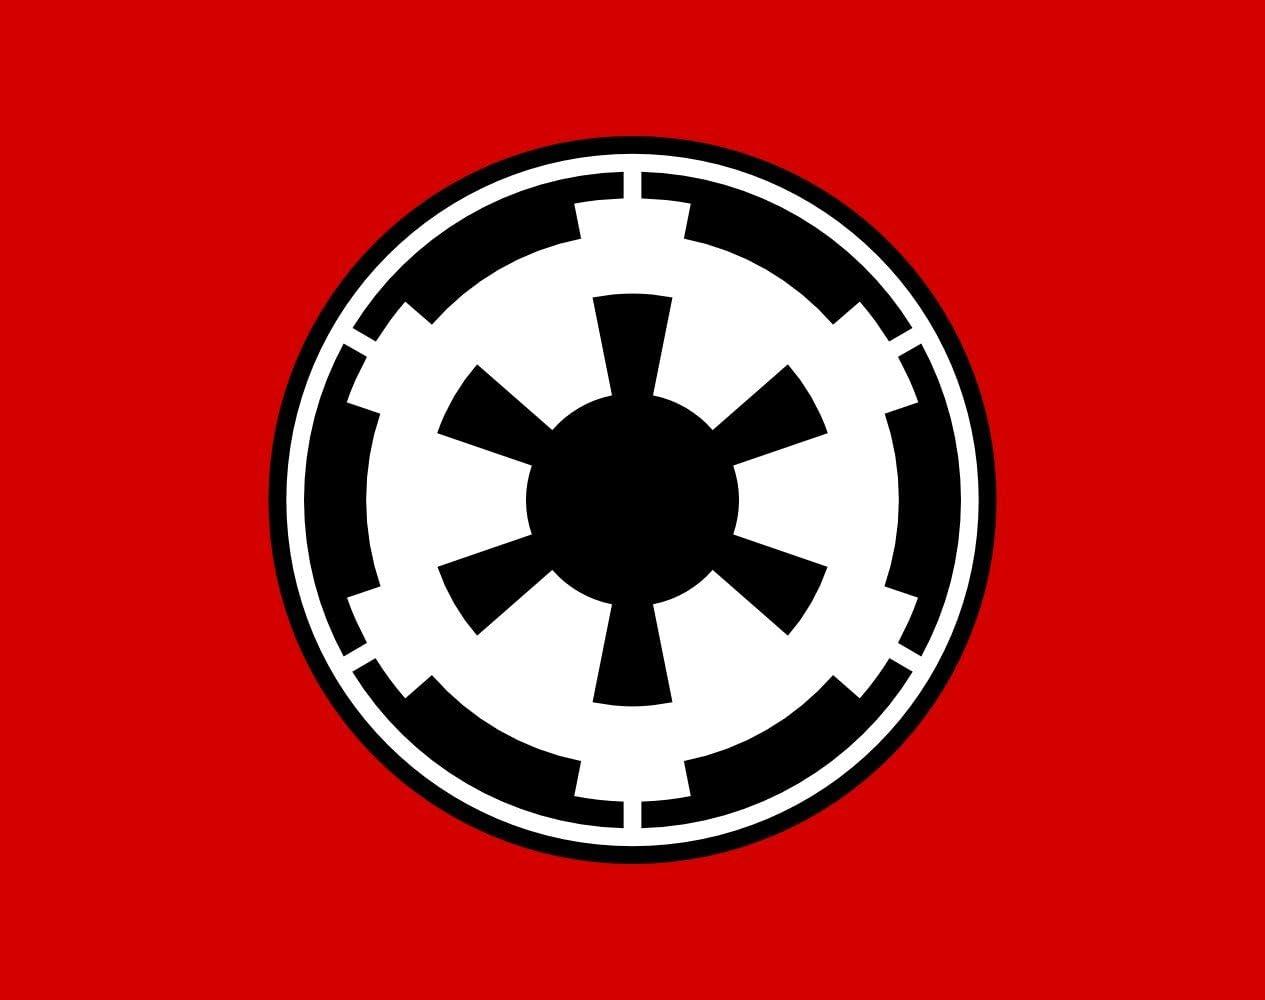 magFlags Bandera Large Galactic Empire | Galactic Empire Star Wars | Bandera Paisaje | 1.35m² | 100x130cm: Amazon.es: Jardín